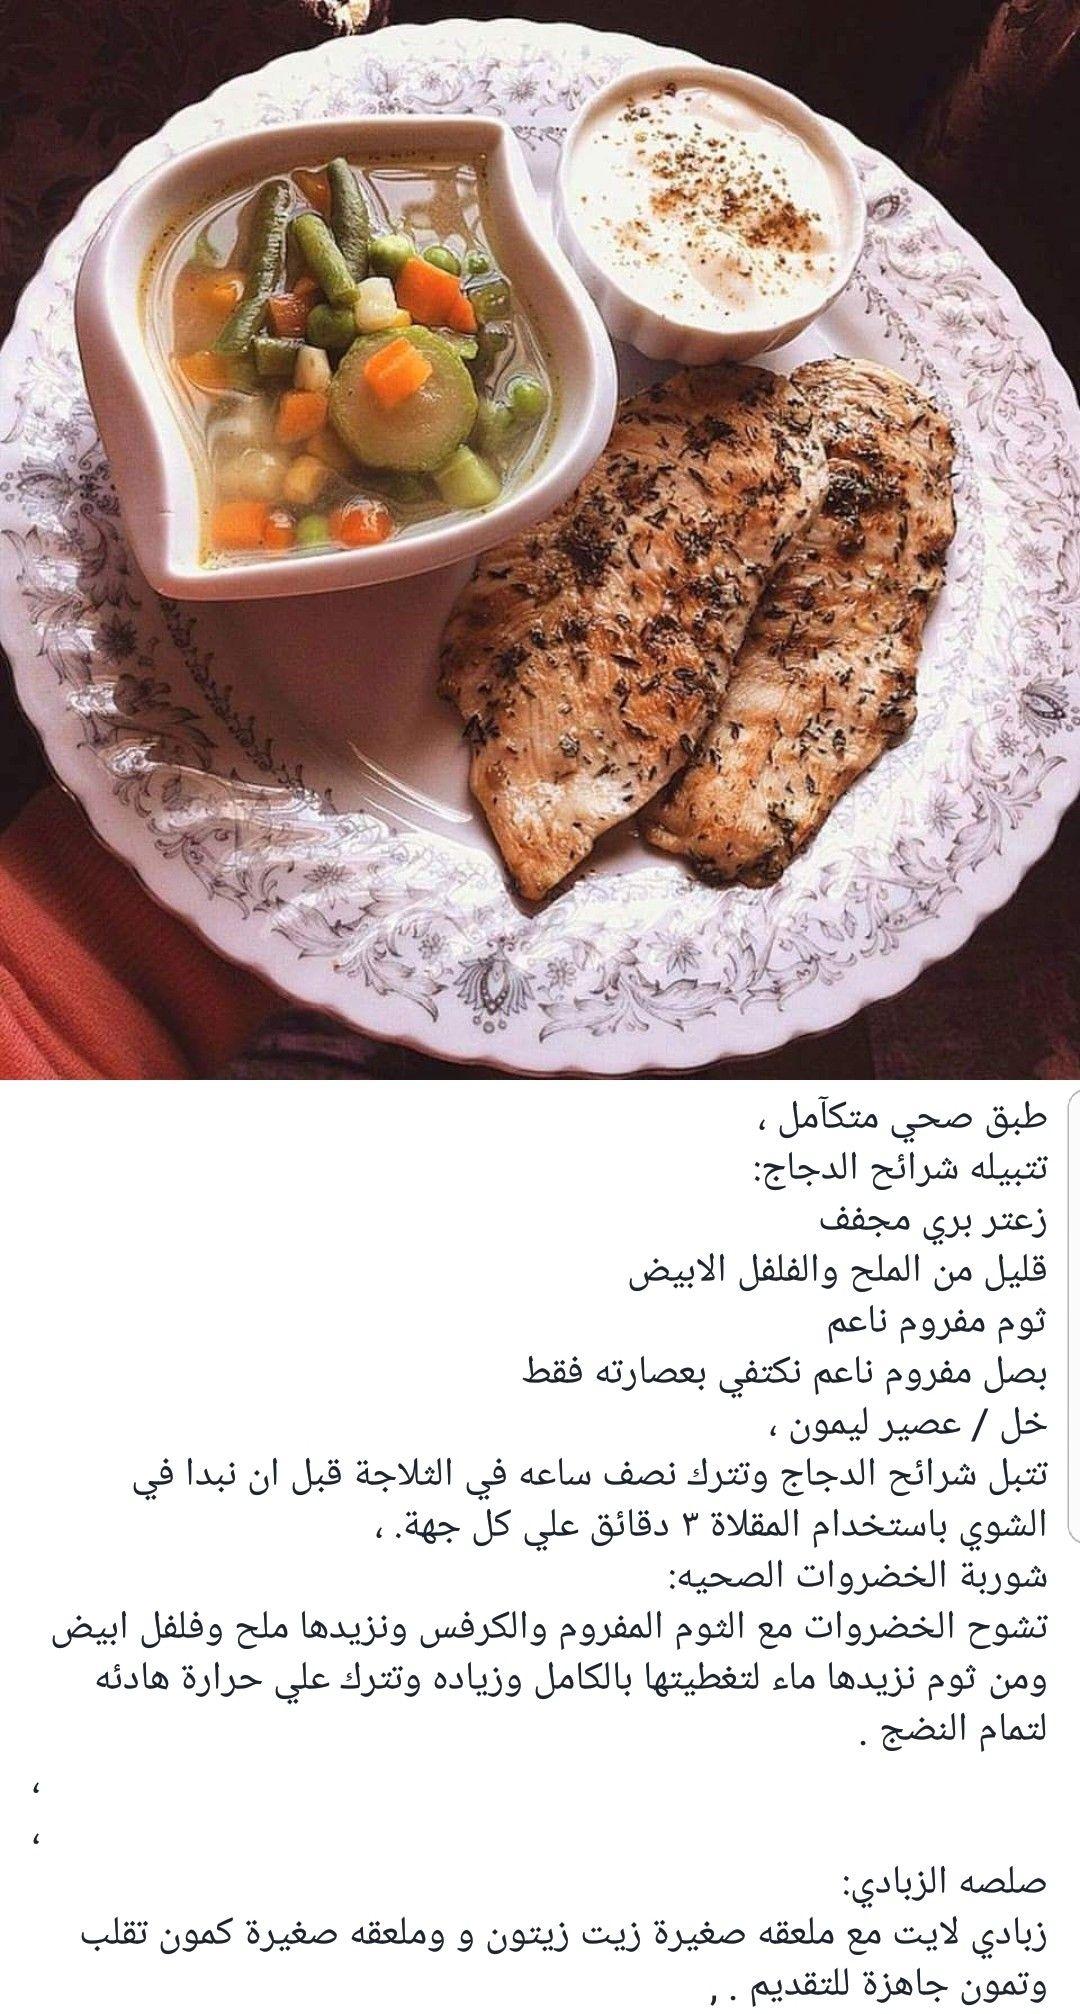 Pin By Nada Attia Gallery On أكلات صحية Healthy Diet Food Cooking Recipes Food Diet Recipes